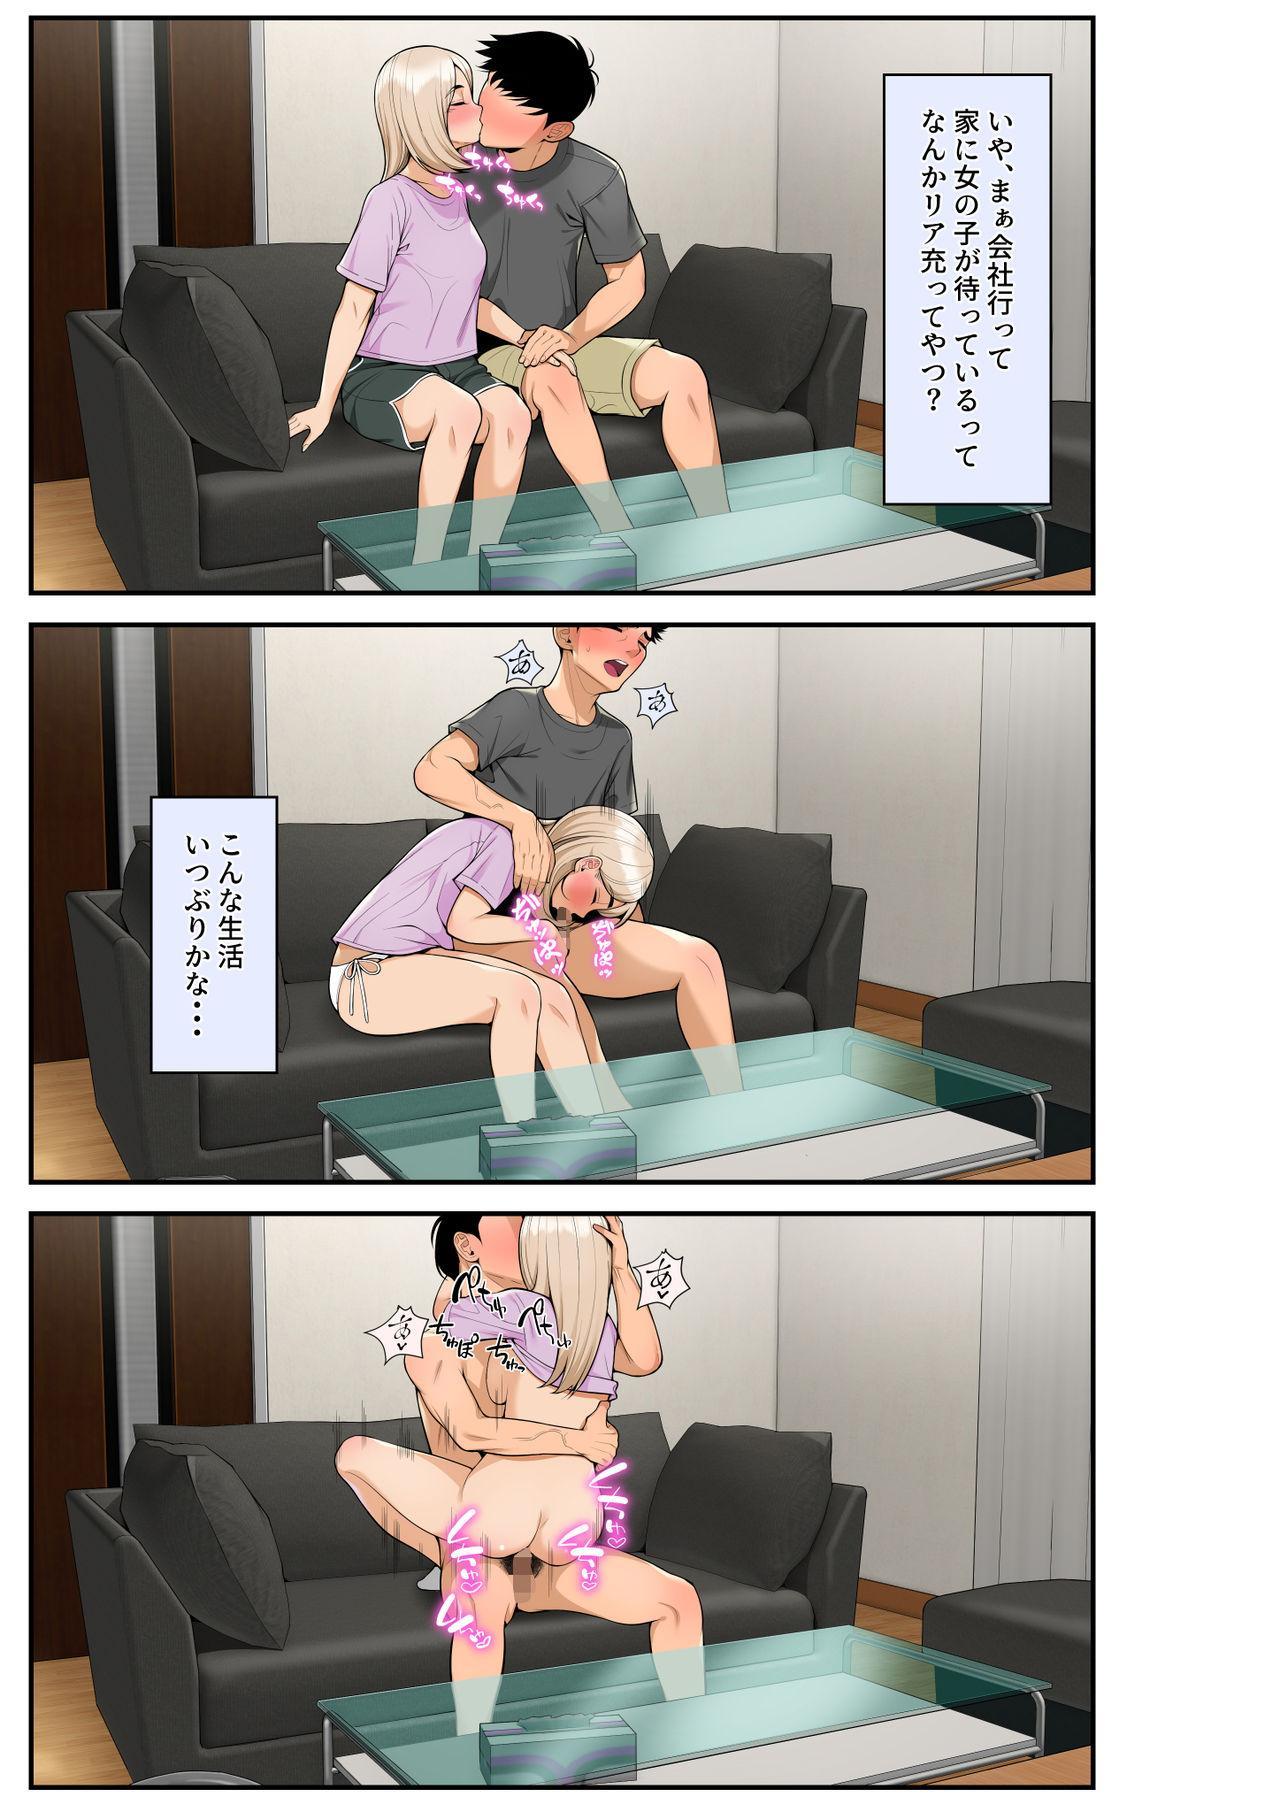 Iede Gal o Hirottara Harem ni Natta Hanashi 38